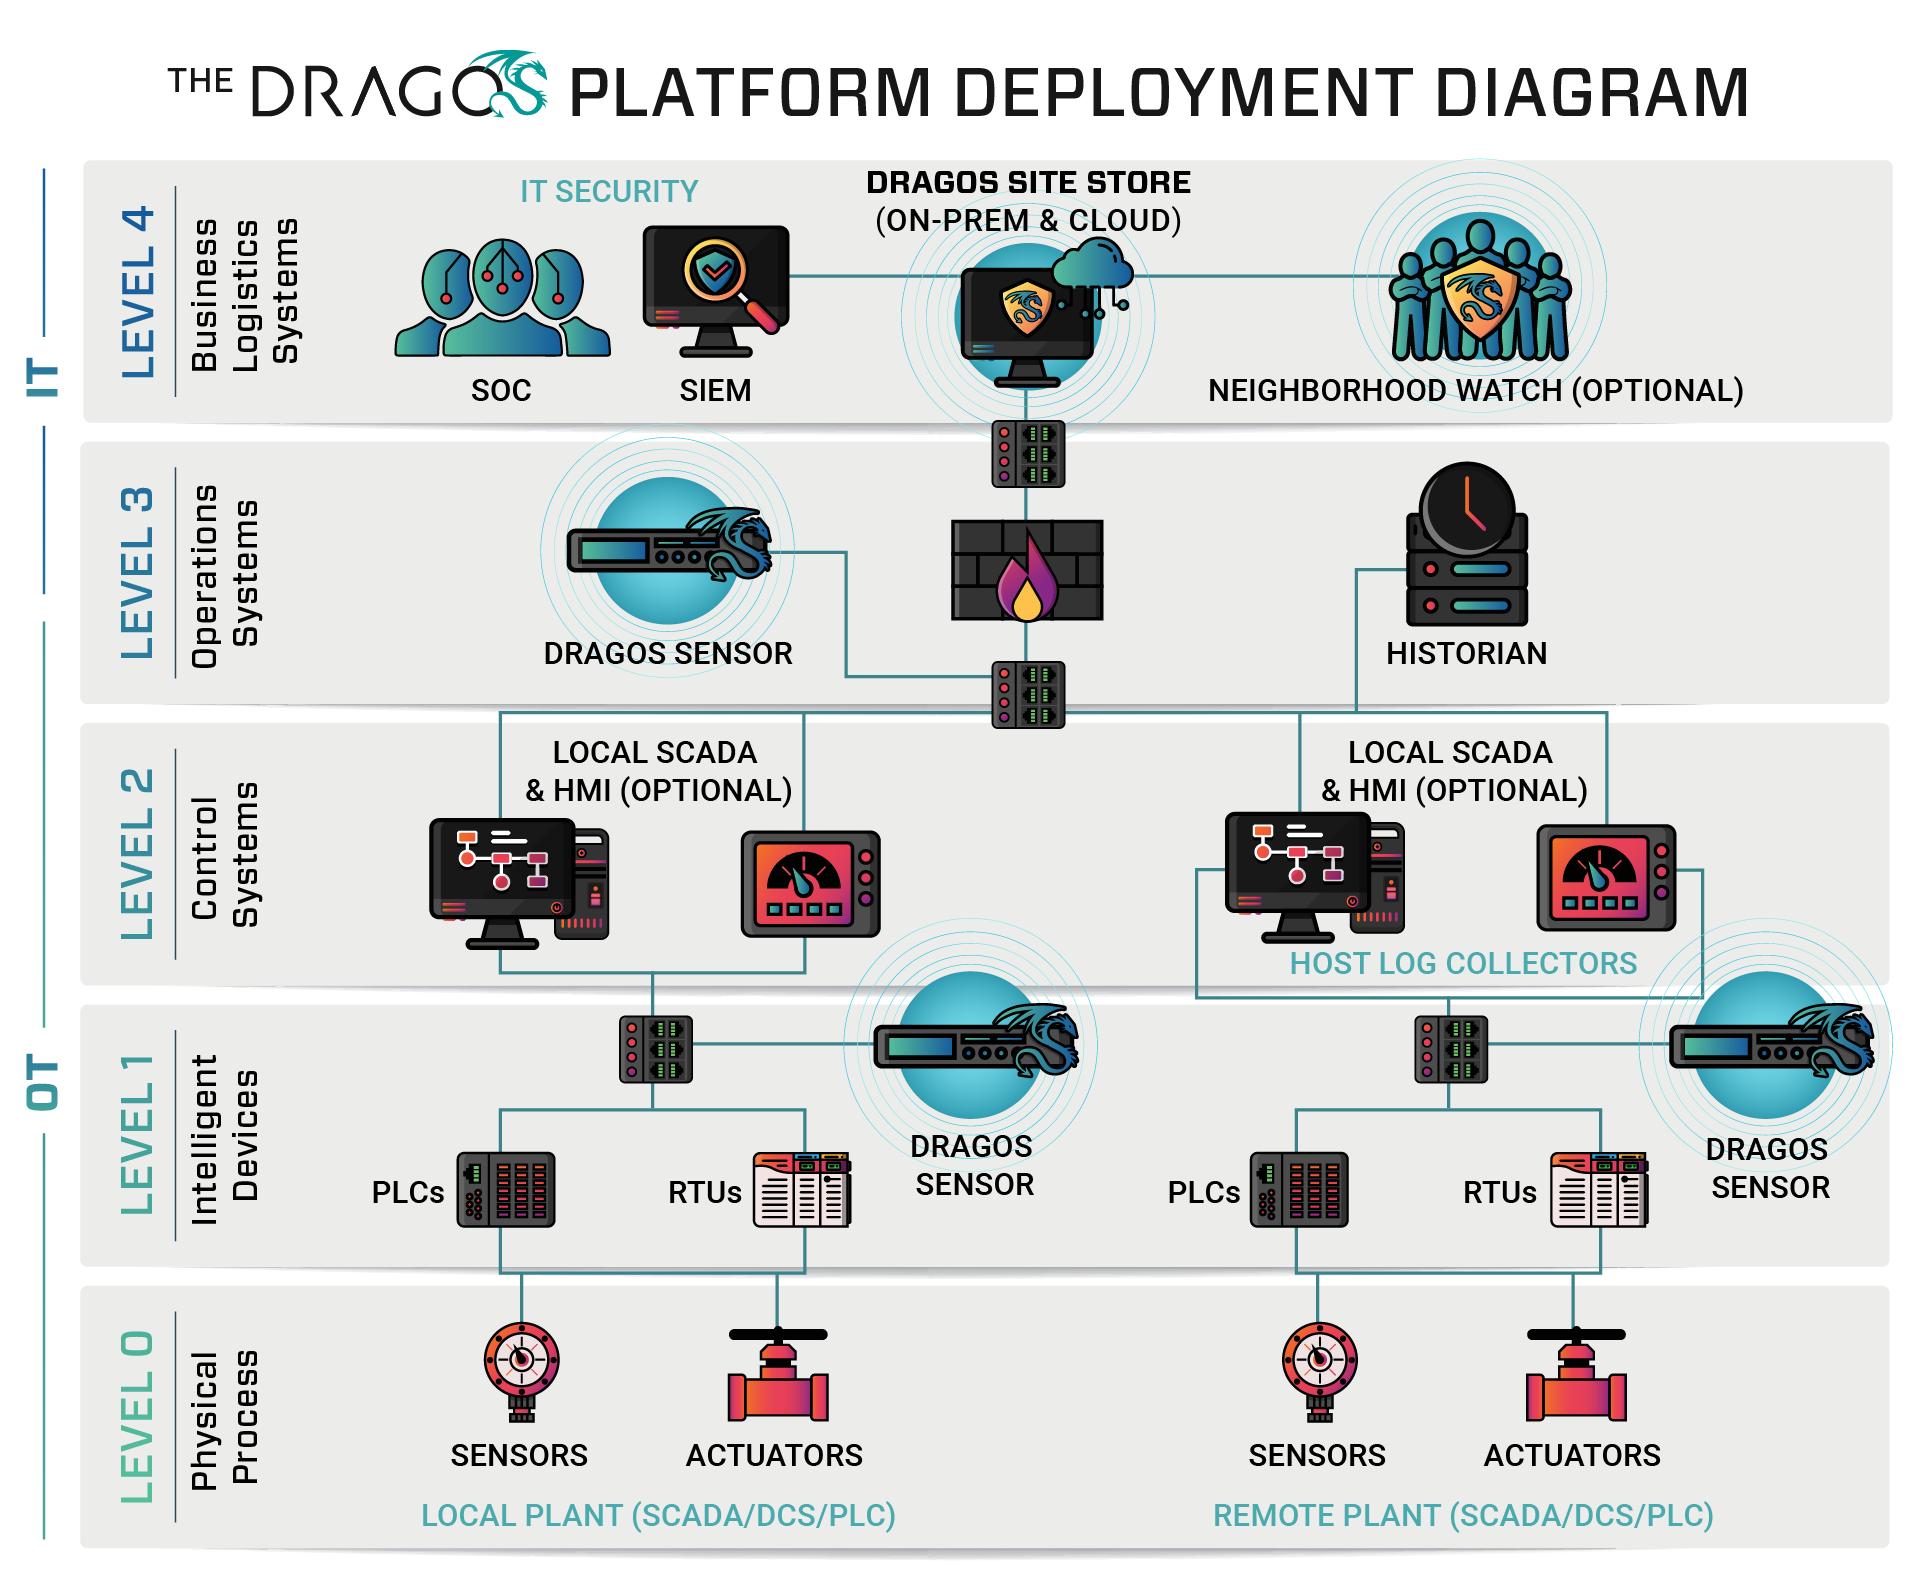 Dragos Platform Deployment Diagram